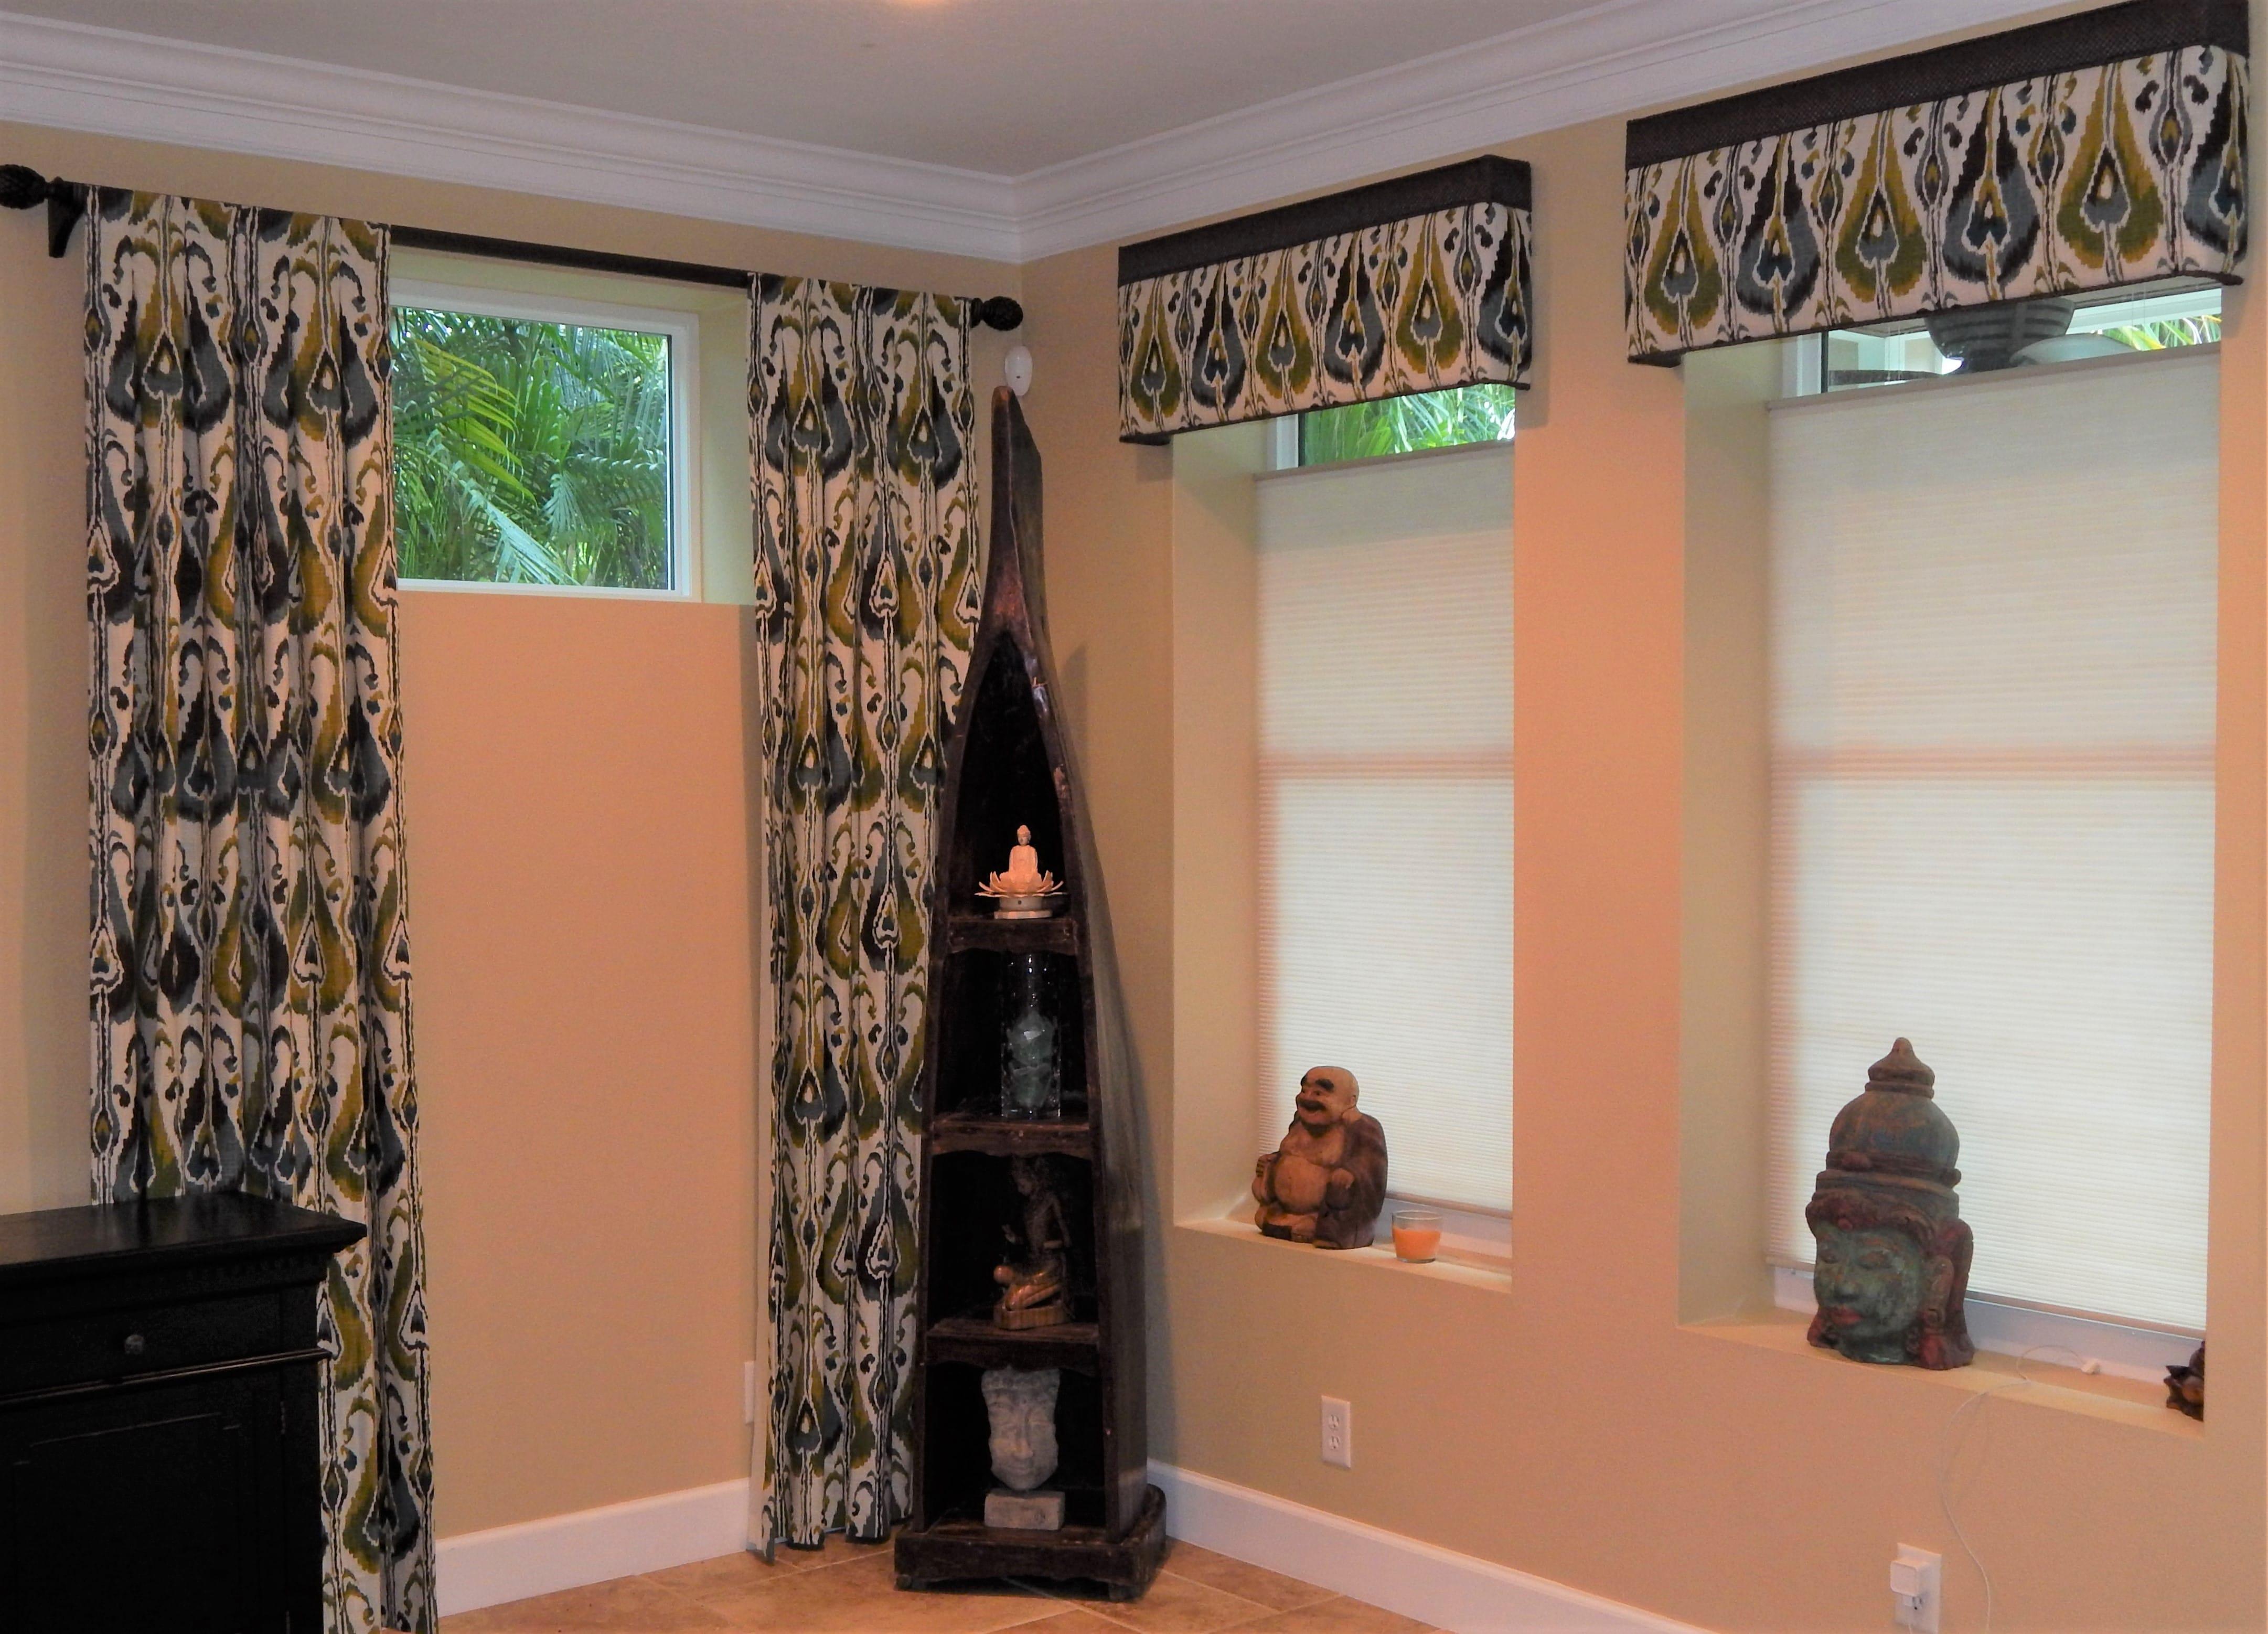 Window Treatments & Plantation Shutters | Persimmon ...